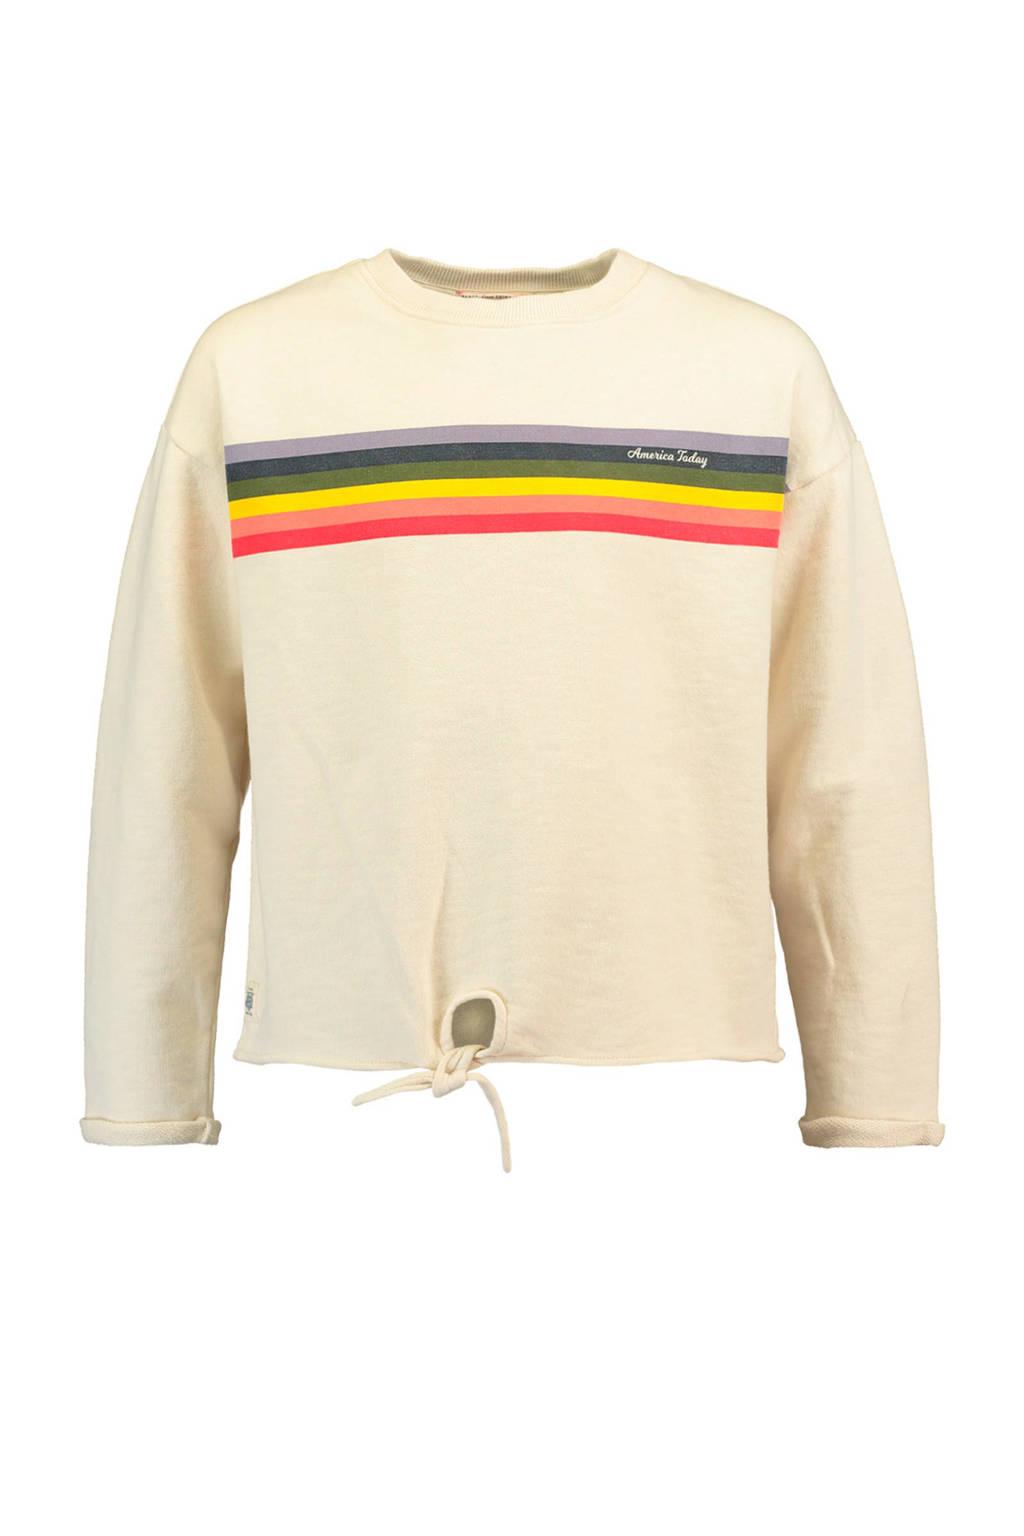 America Today Junior sweater Silvie met strepen ecru, Ecru